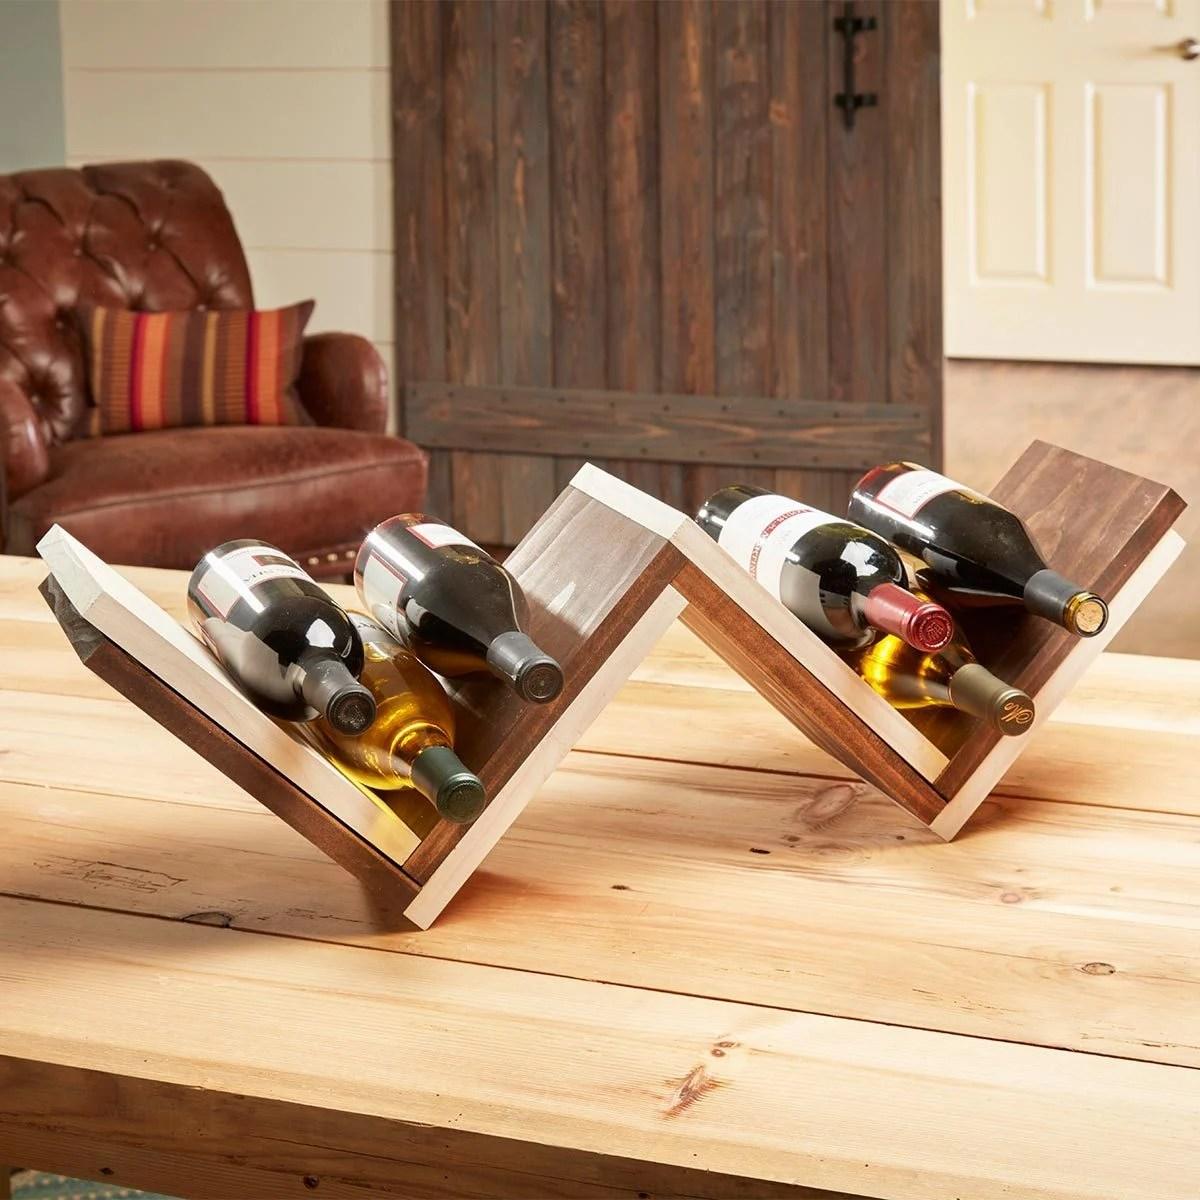 23 Wine Racks And Hacks The Family Handyman